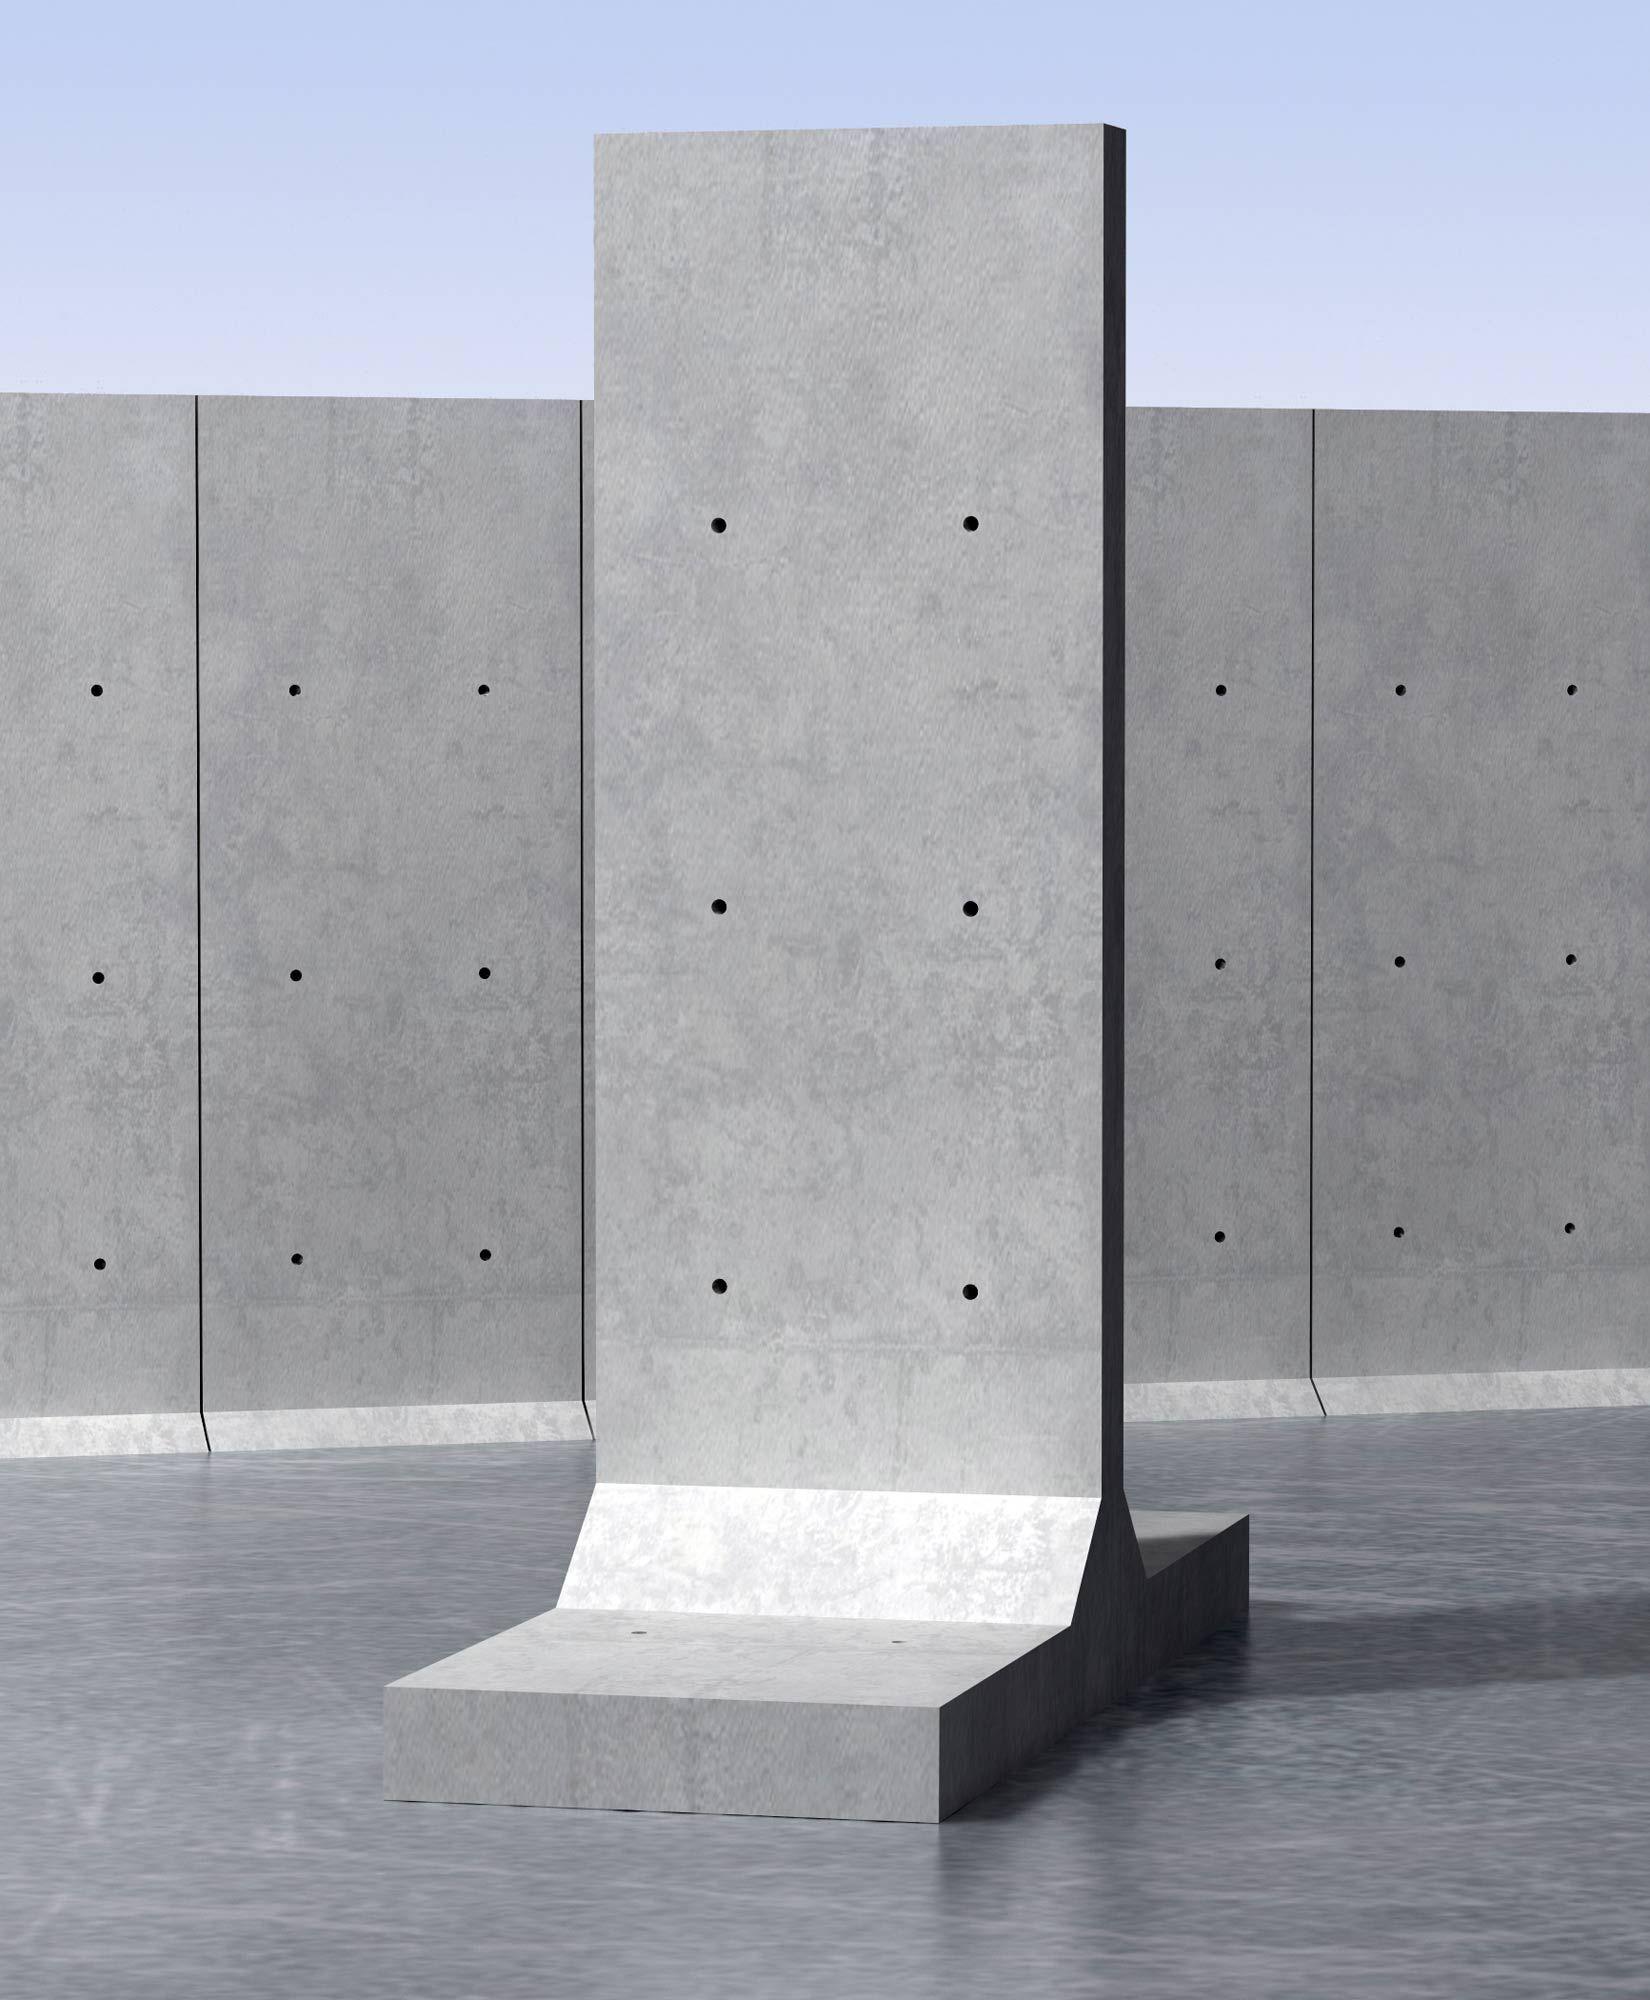 Pin By Glenio Trevizan On Statyba Concrete Retaining Walls Building A Retaining Wall Precast Concrete